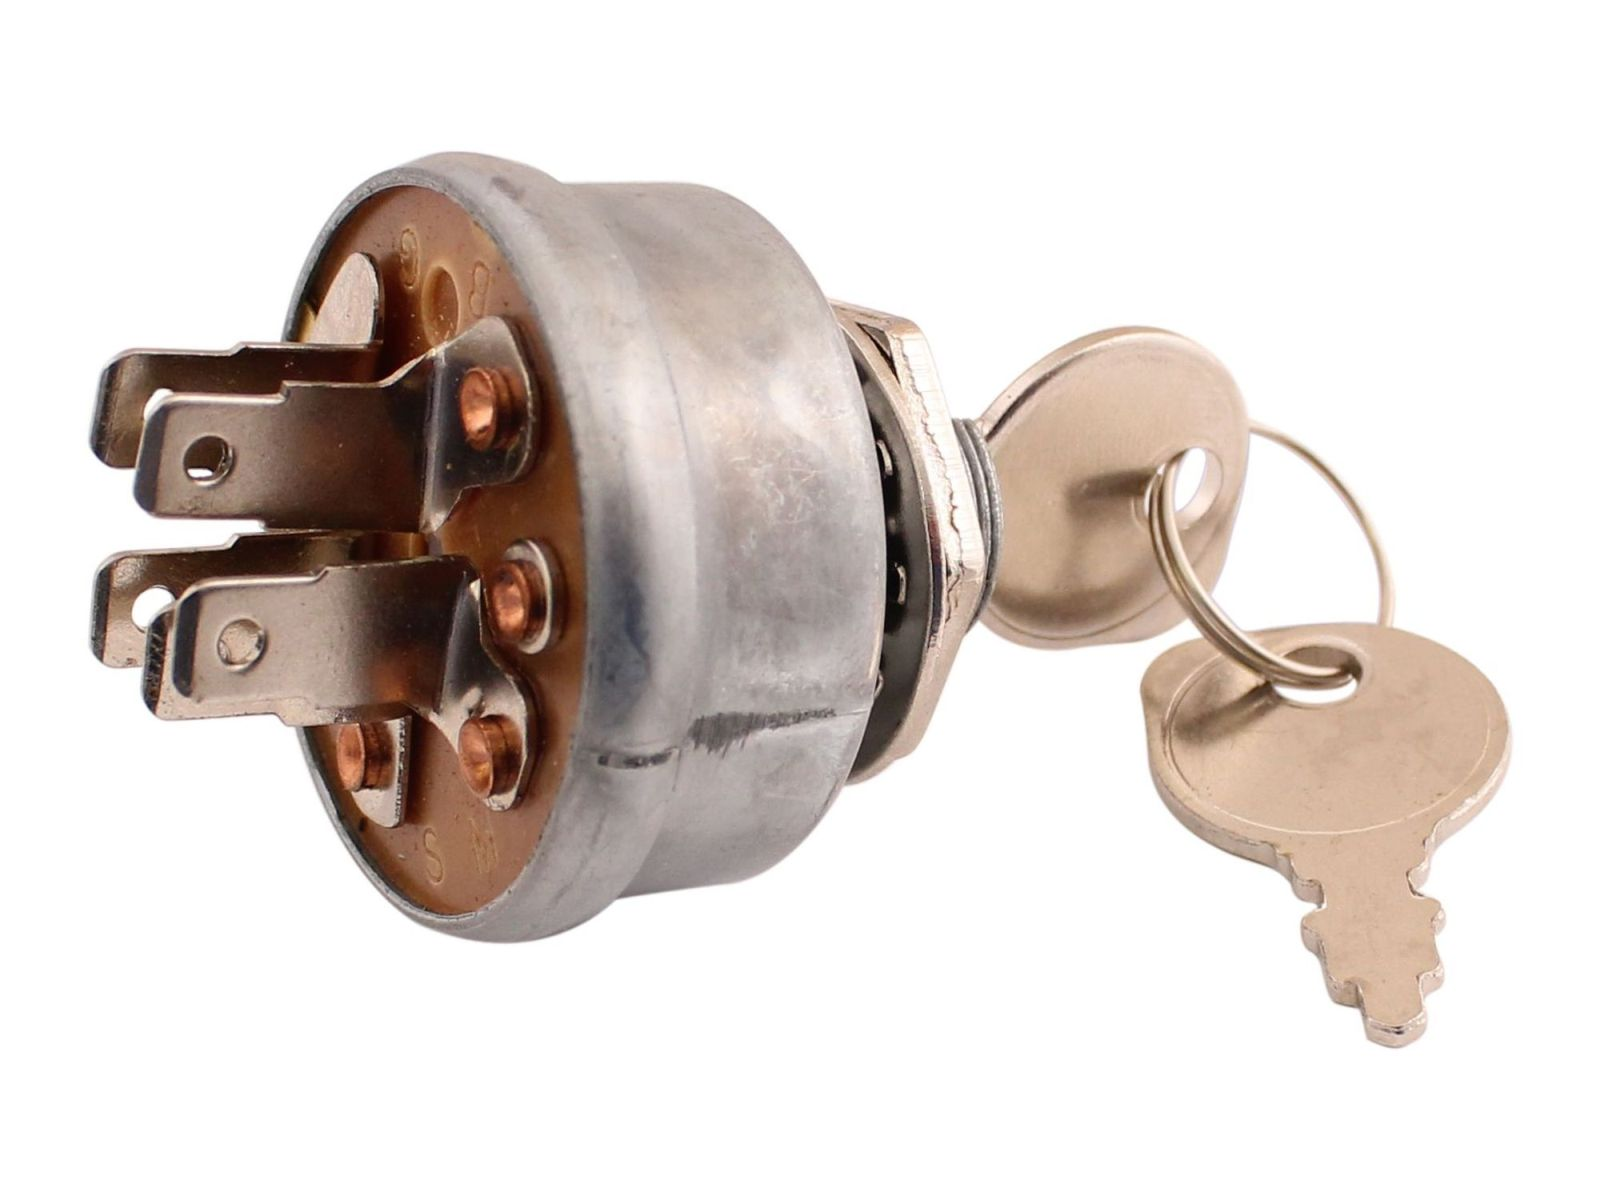 Zündschloss 5-Pol passend MTD 13//102 135N765N678 Rasentraktor